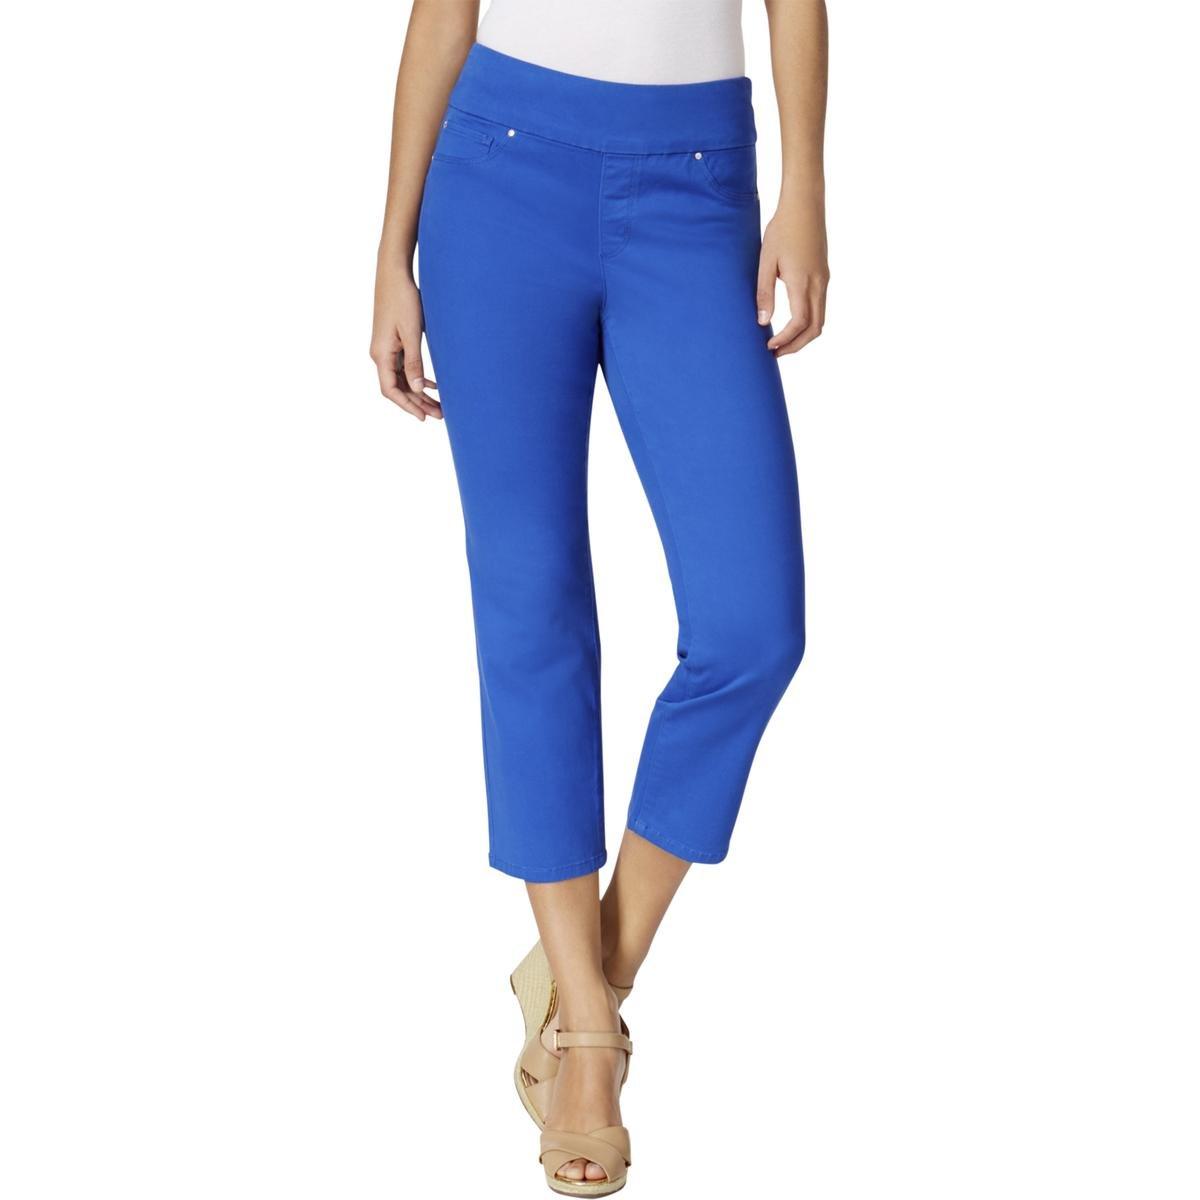 Charter Club Womens Jegging Comfort Waist Capri Jeans Blue 8